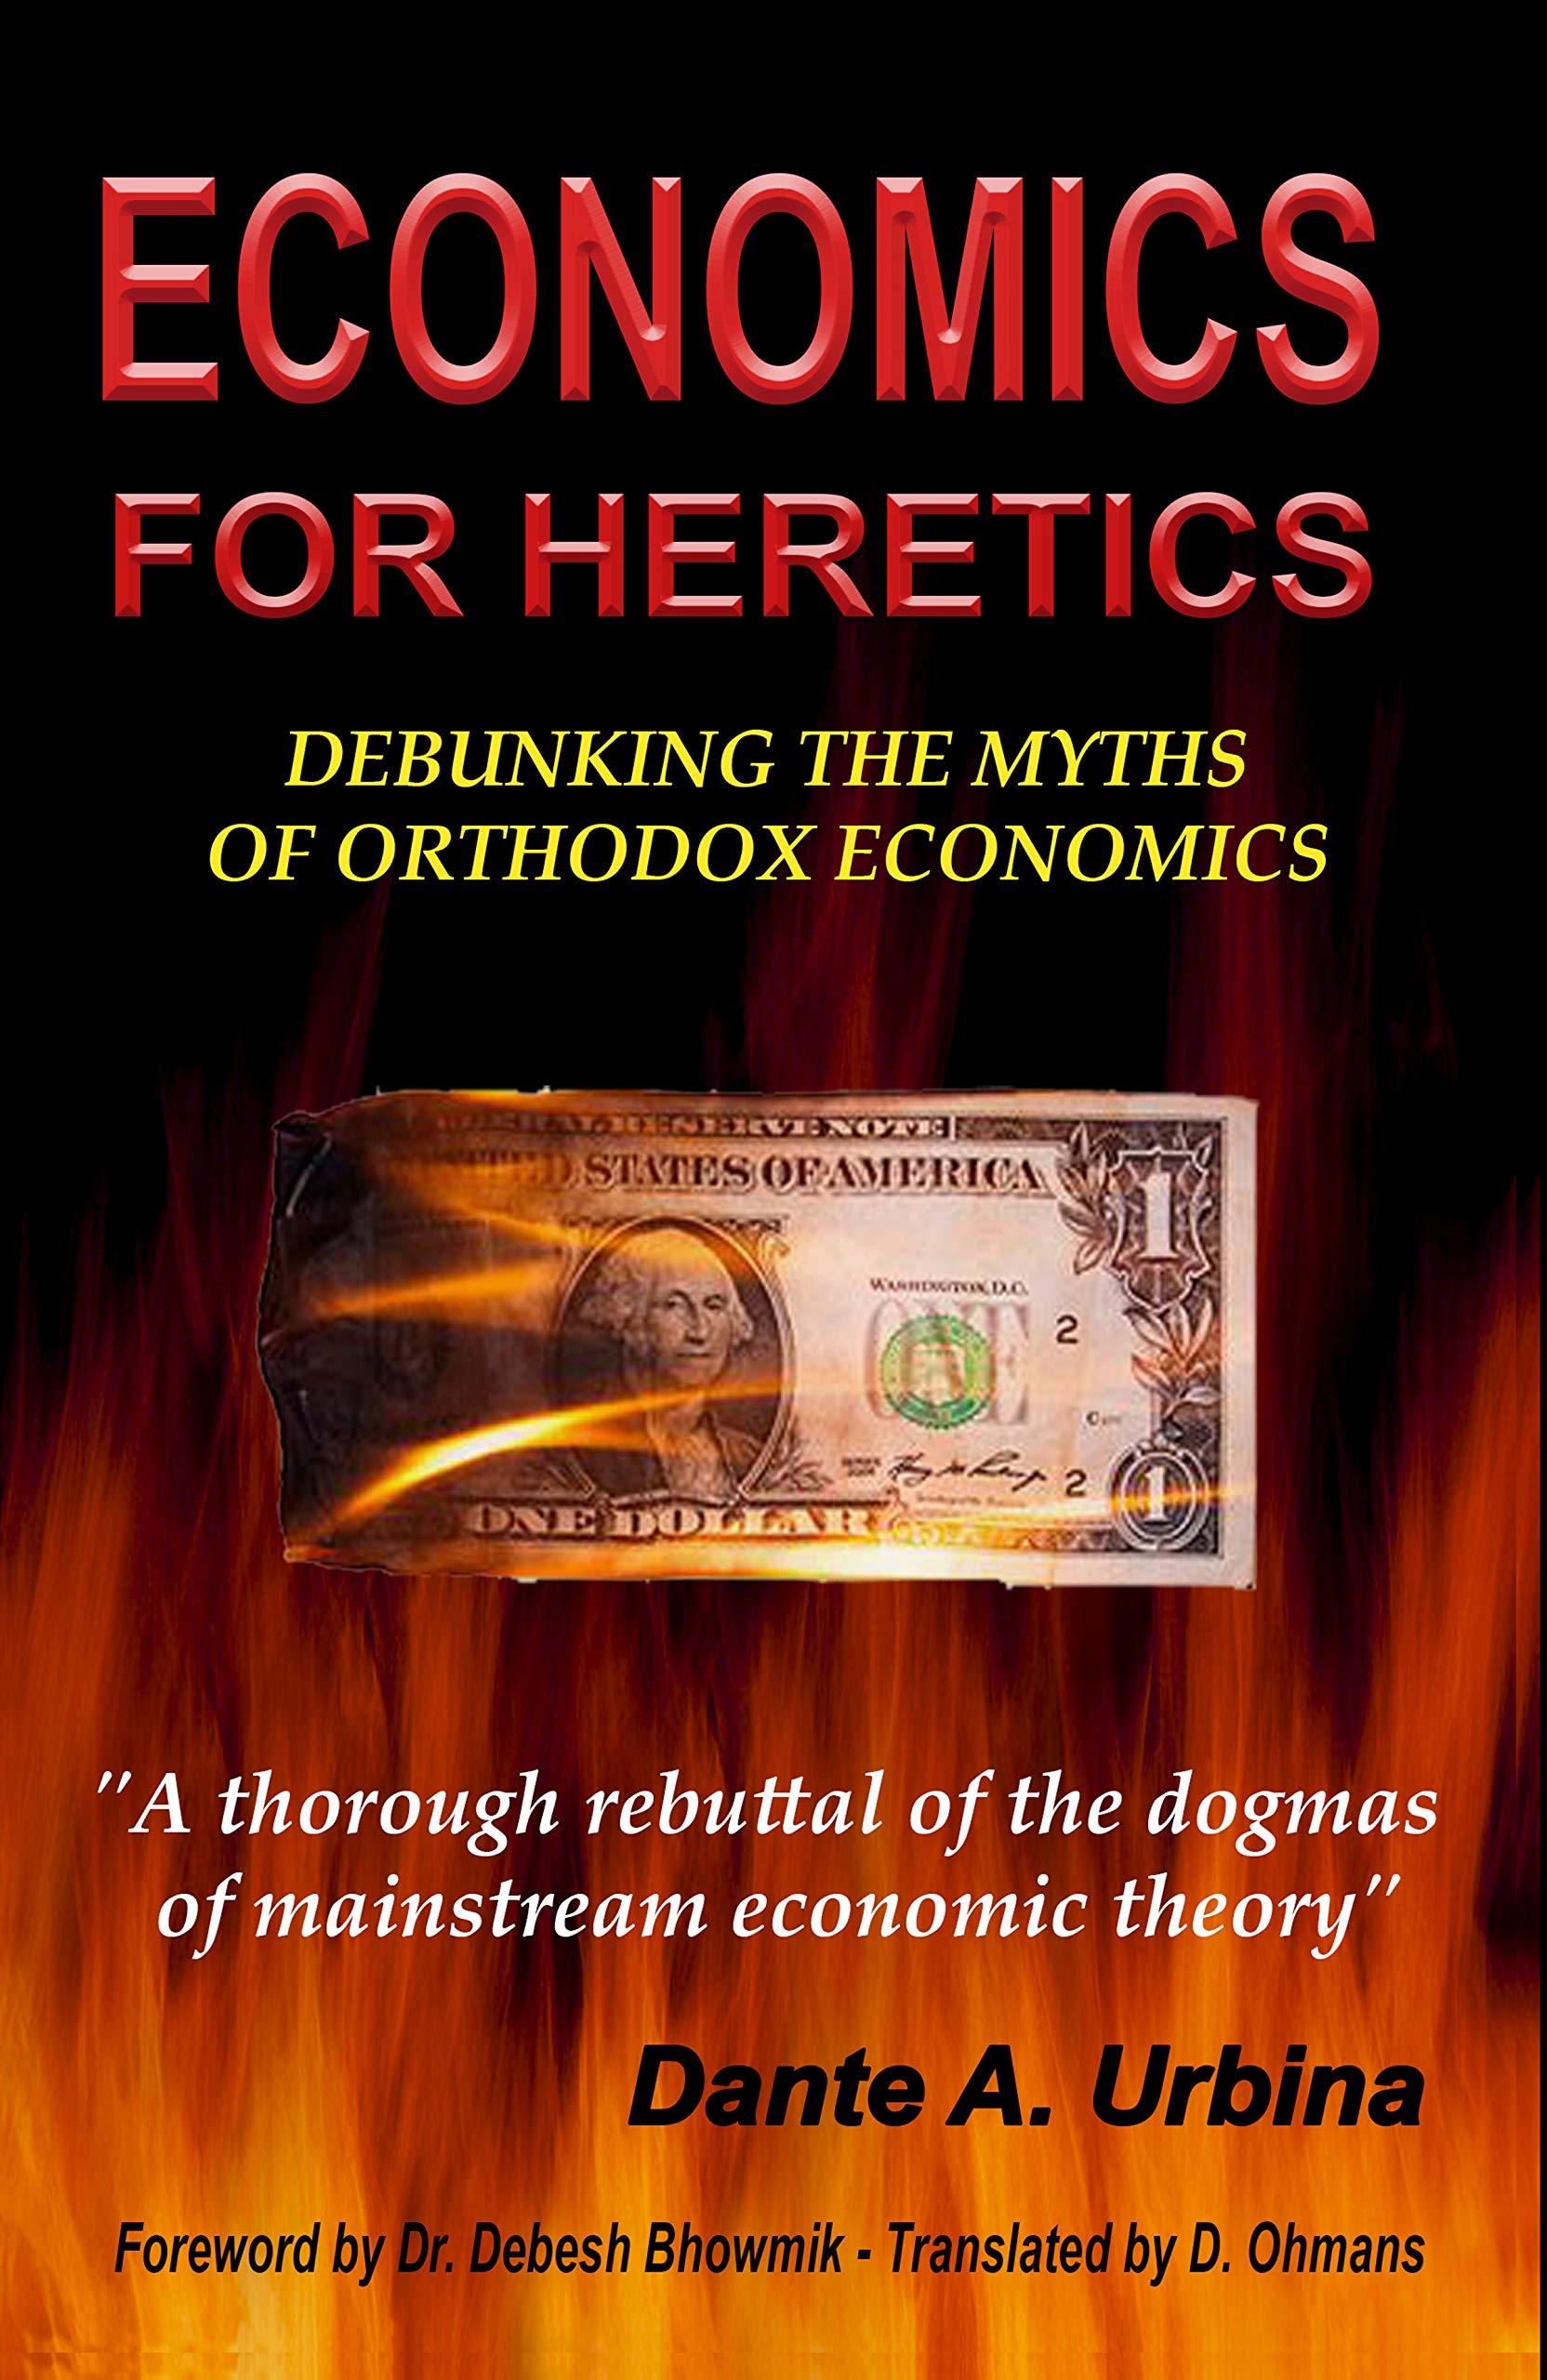 ECONOMICS FOR HERETICS: Debunking the Myths of Orthodox Economics